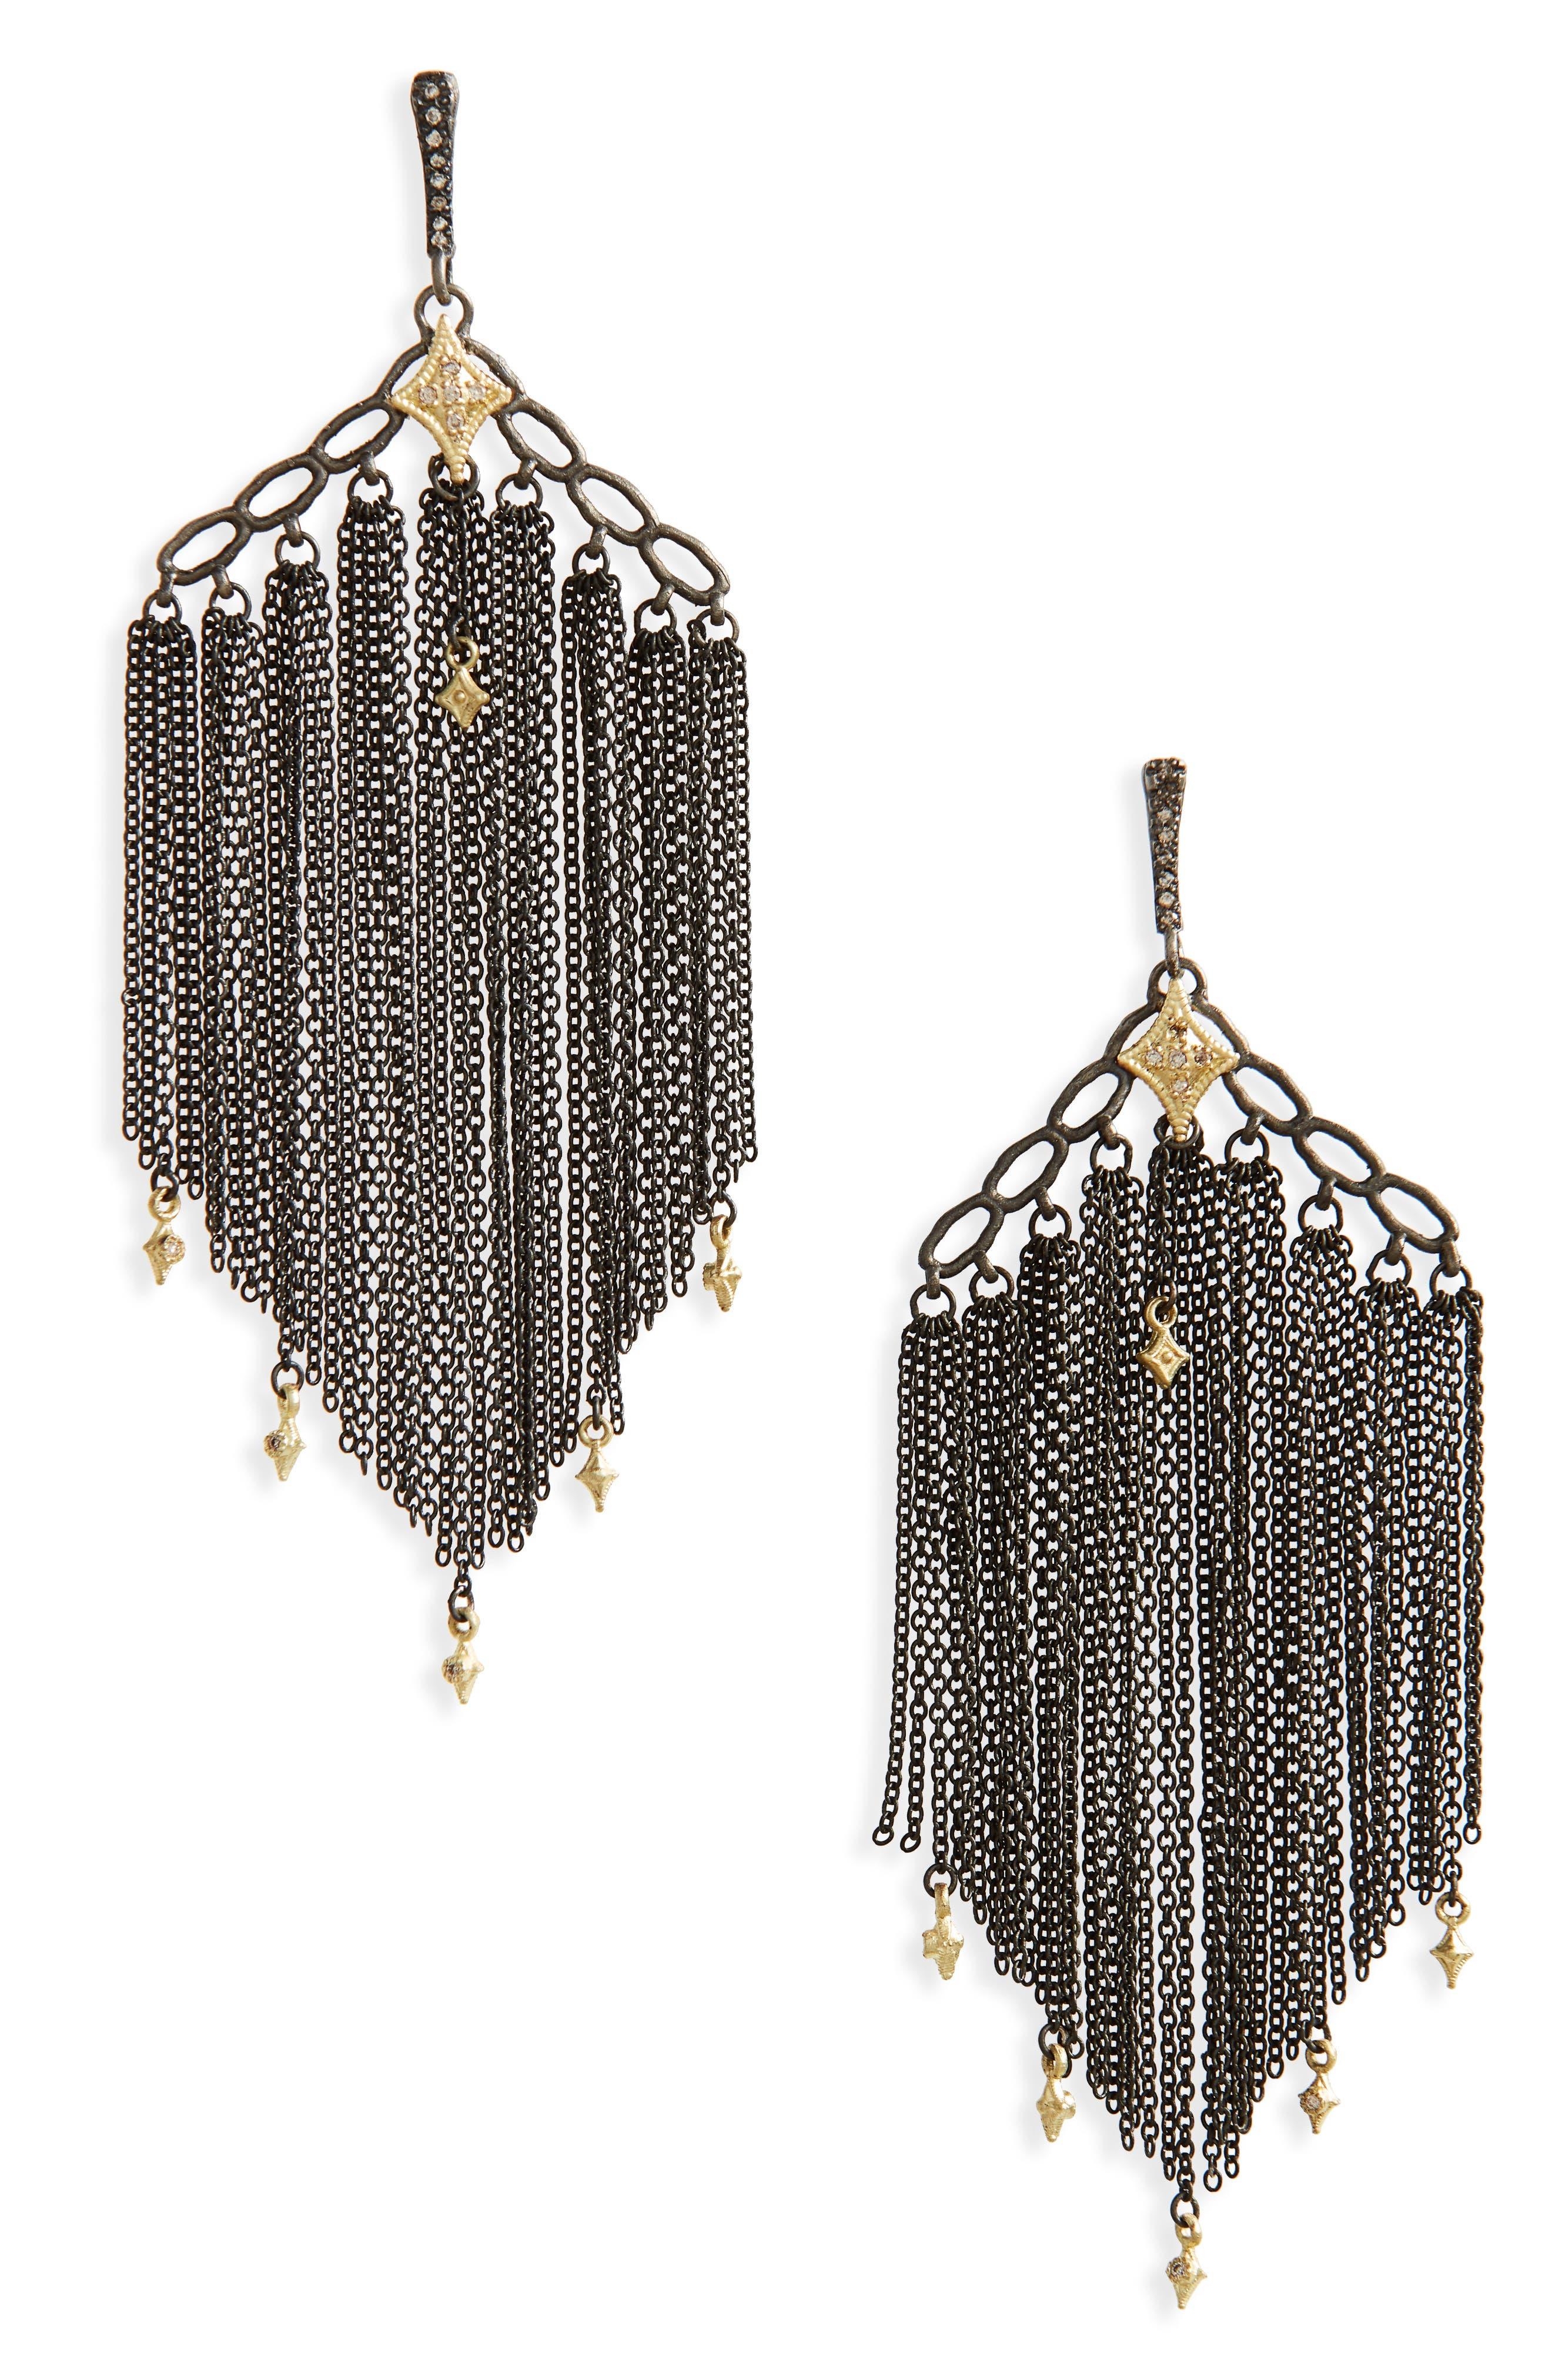 Old World Crivelli Chain Earrings,                         Main,                         color, BLACKENED SILVER/ DIAMONDS